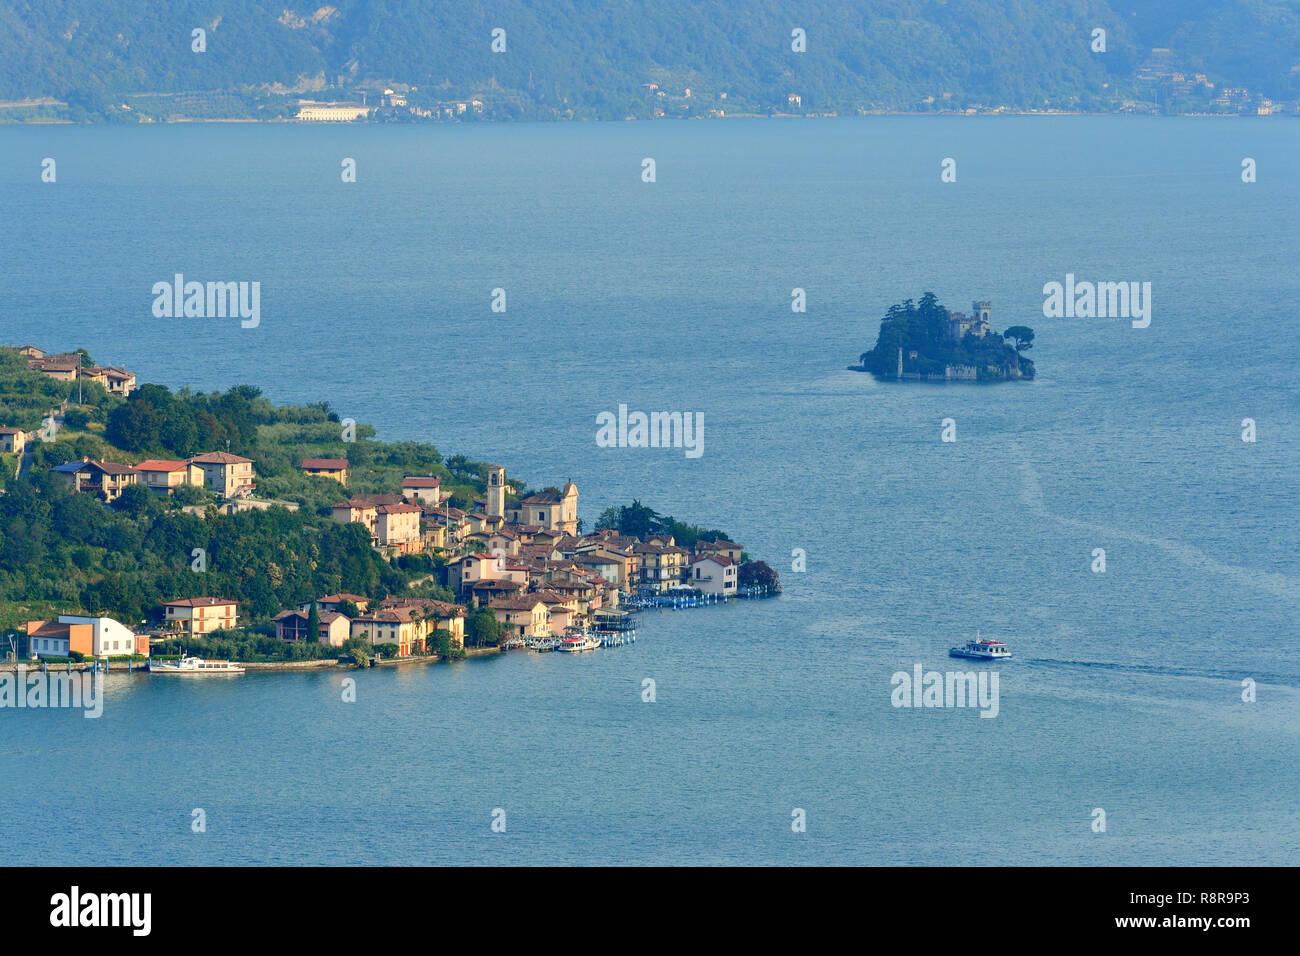 Italy, Lombardy, Iseo lake (Il Lago d'Iseo), Monte Isola island, Carzano village and Loreto Island - Stock Image